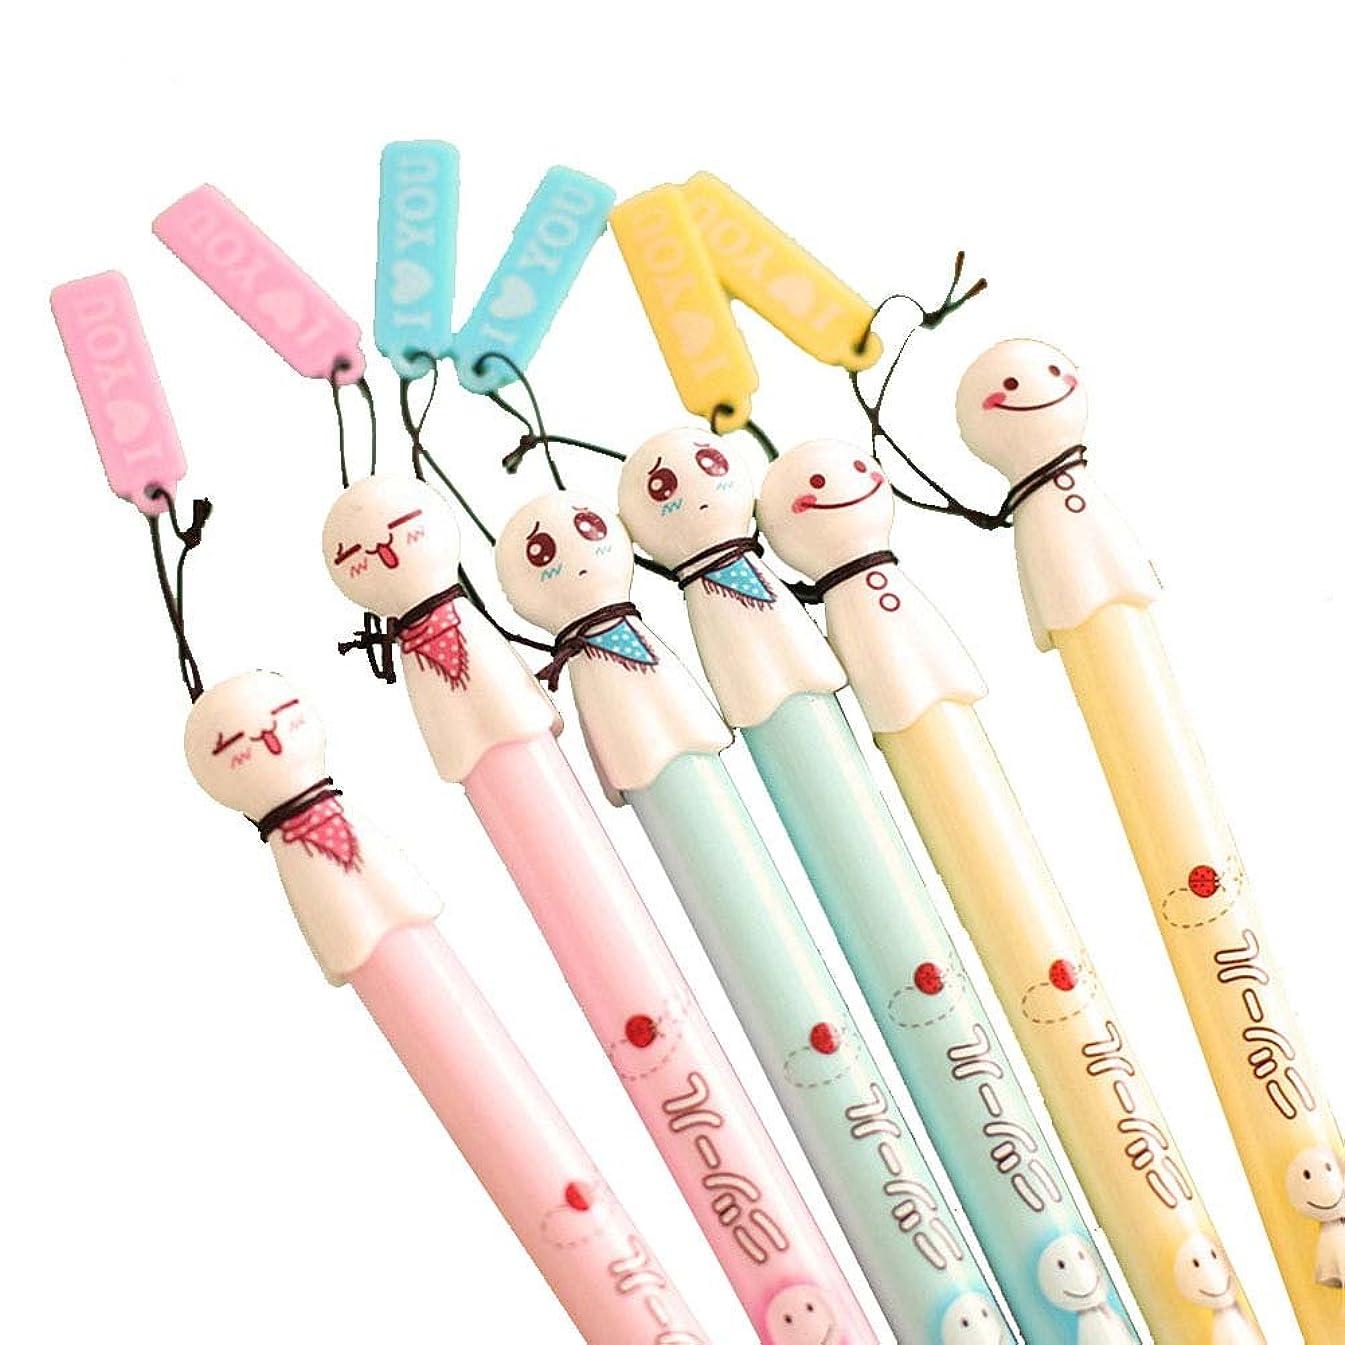 JUIOKK 6PCS Sunny Doll Ornament Black 0.38mm Ink Gel Pens School Office Supplies Creative Stationery